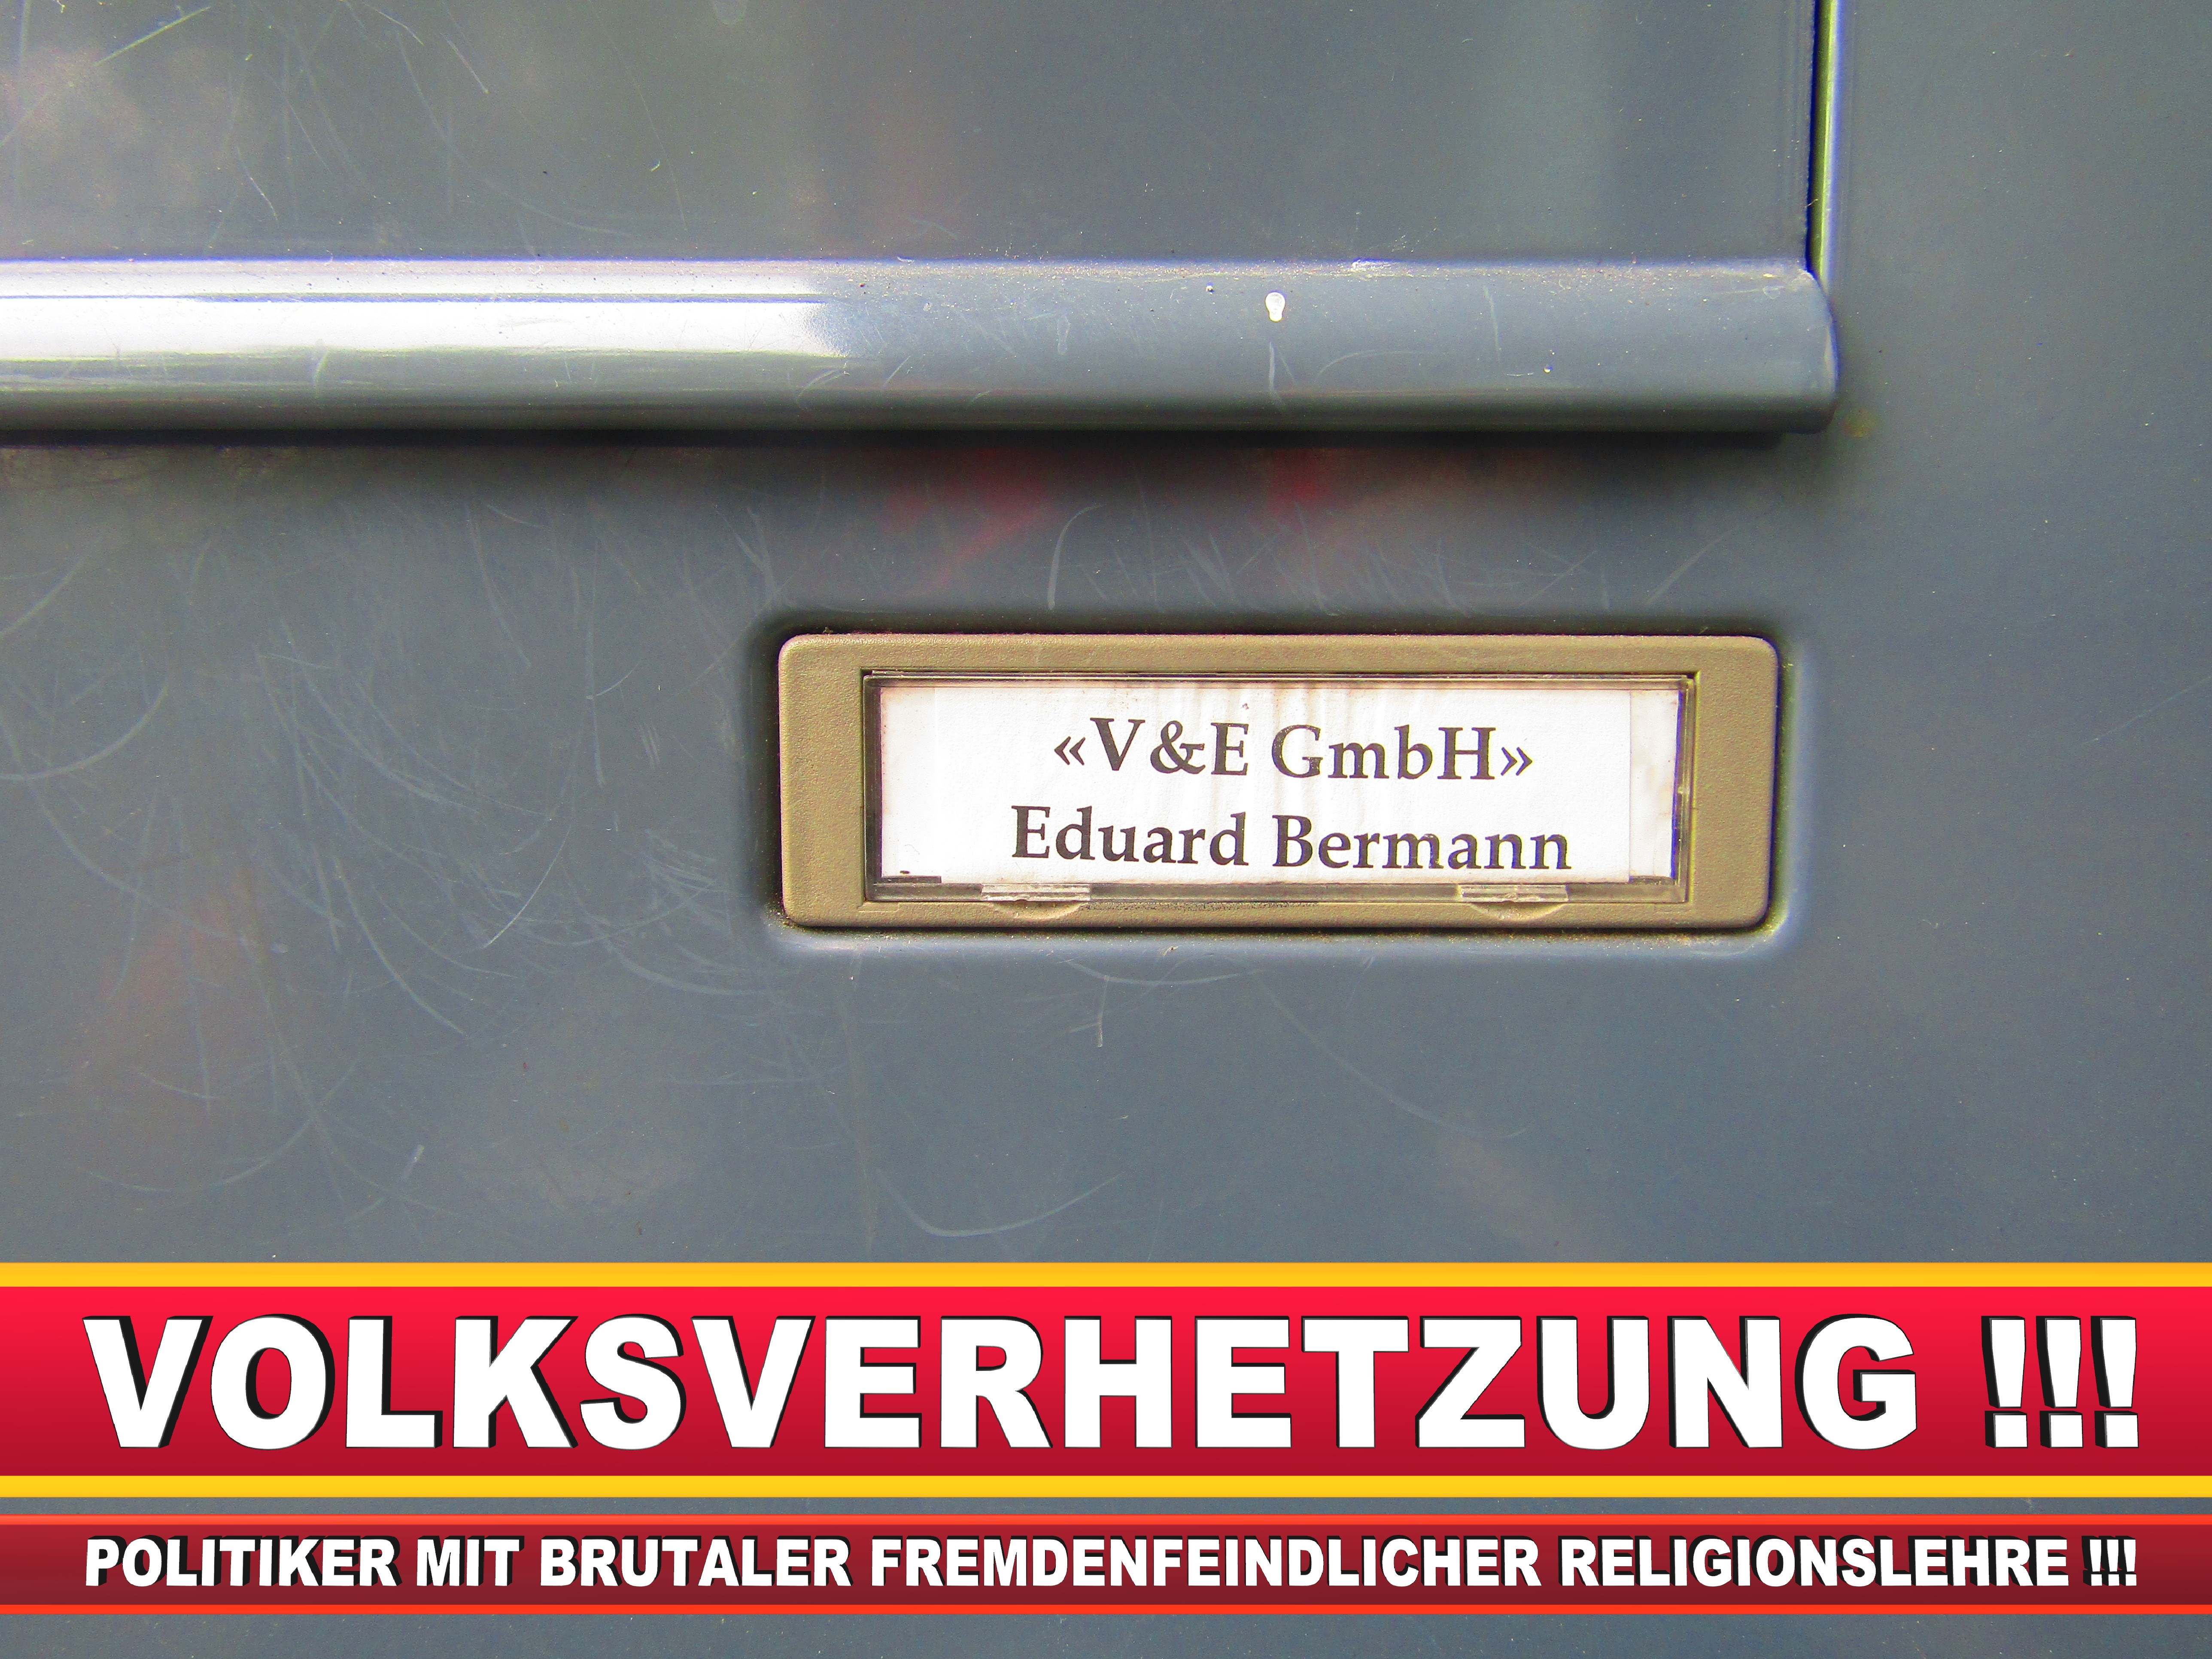 V&E GMBH EDUARD BERMANN LANDTAGSWAHL BUNDESTAGSWAHL BÜRGERMEISTERWAHL